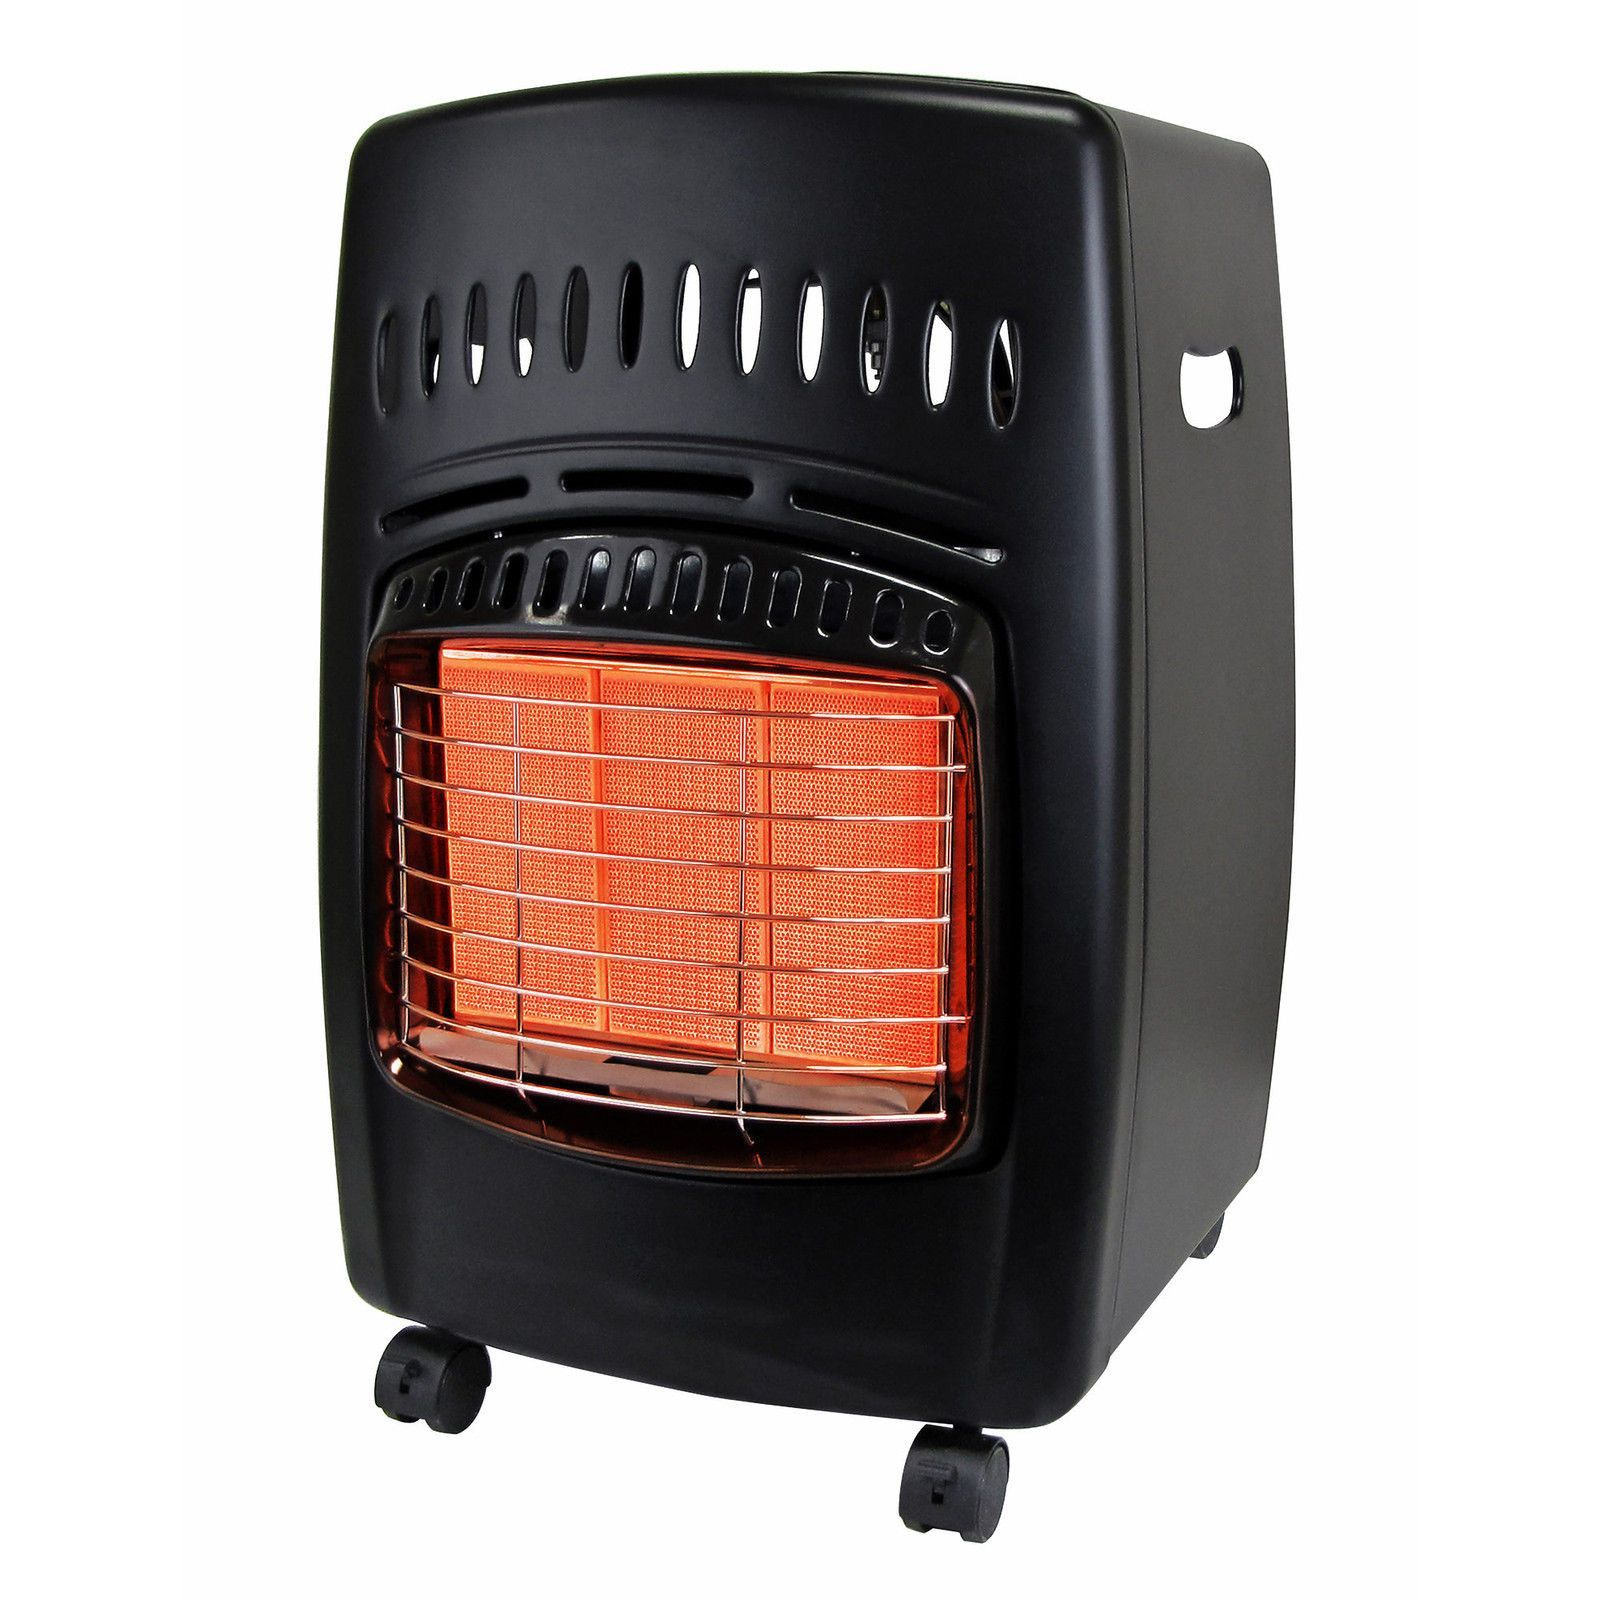 Dyna Glo RA18LPDG 18000 BTU Propane Heater Black